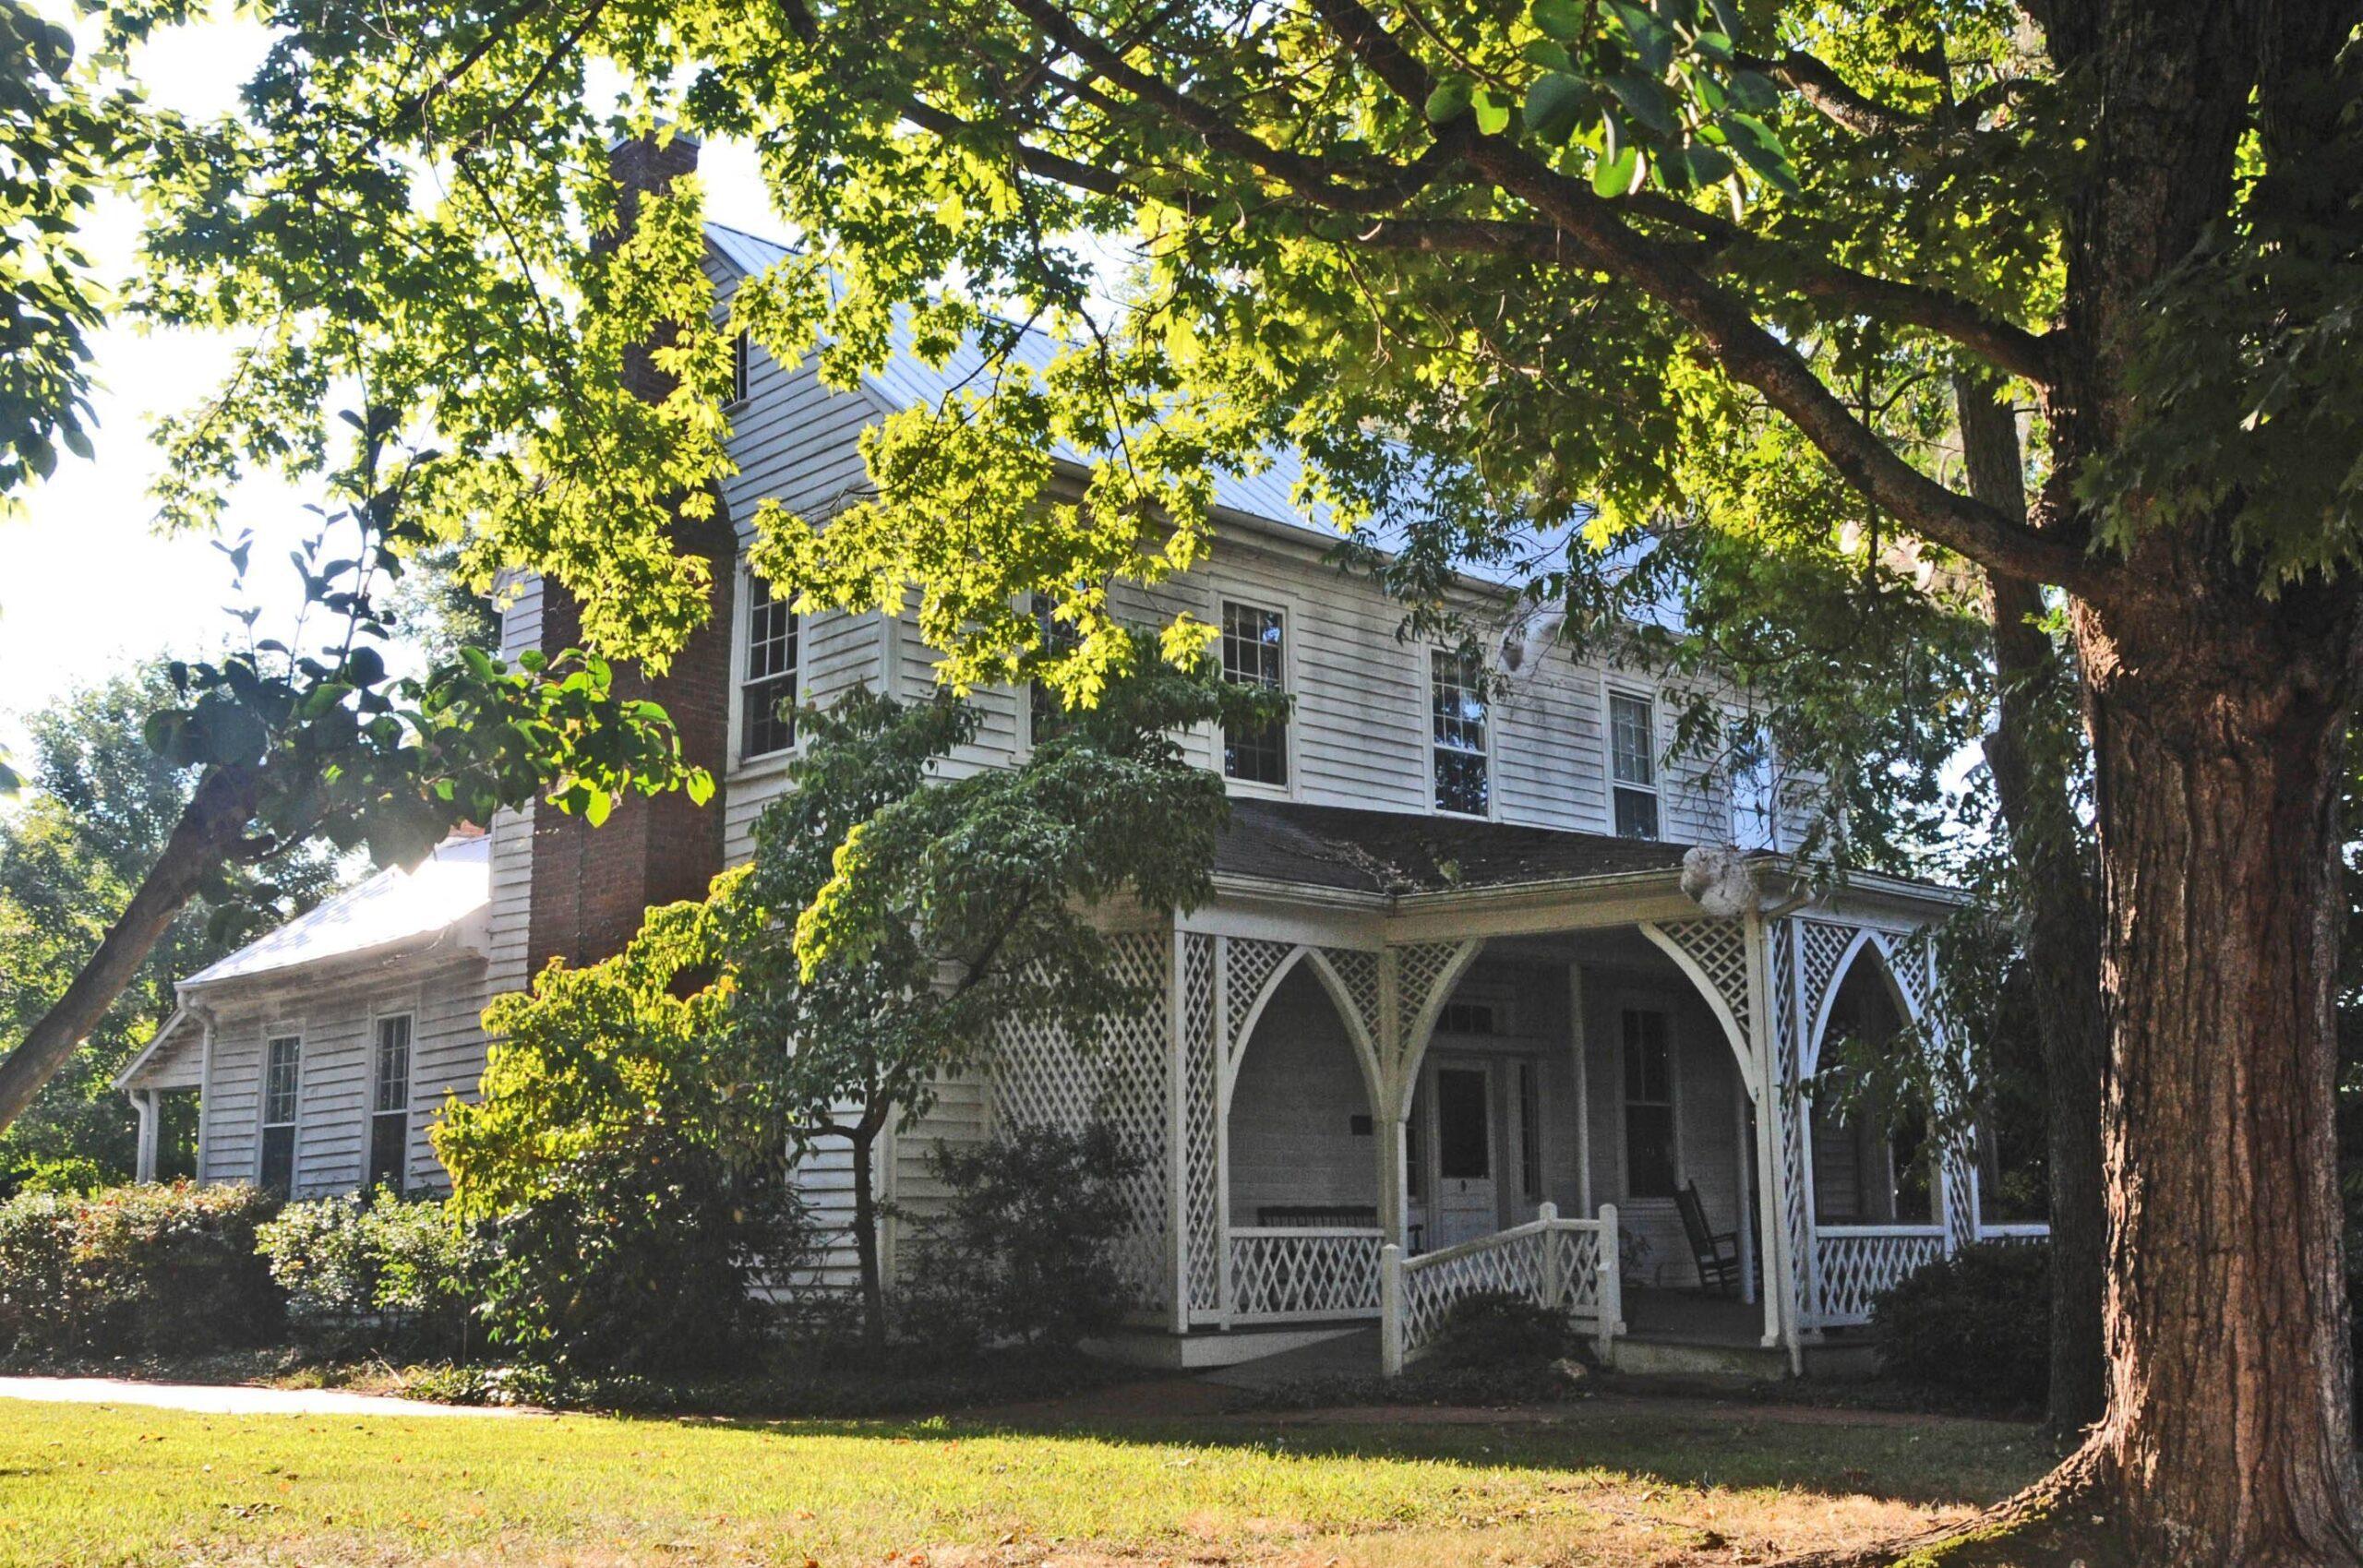 Pittsboro NC historic district